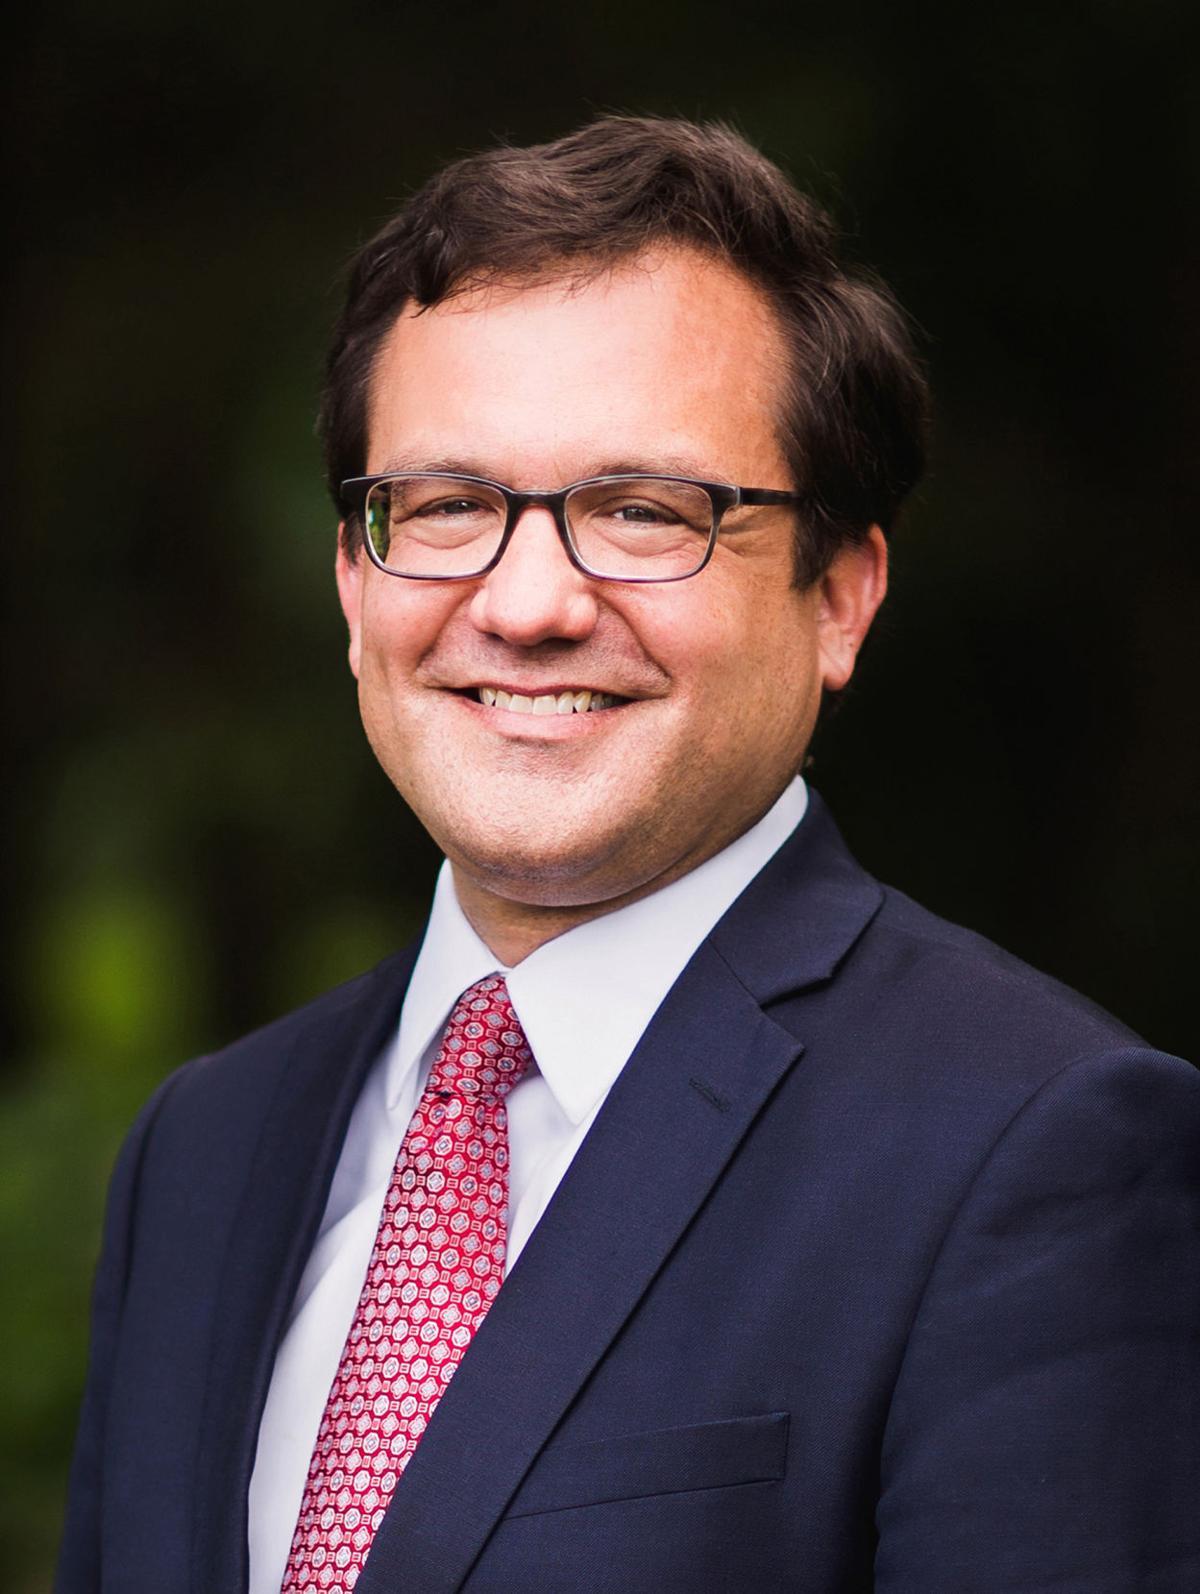 John Swallow, Carthage College president